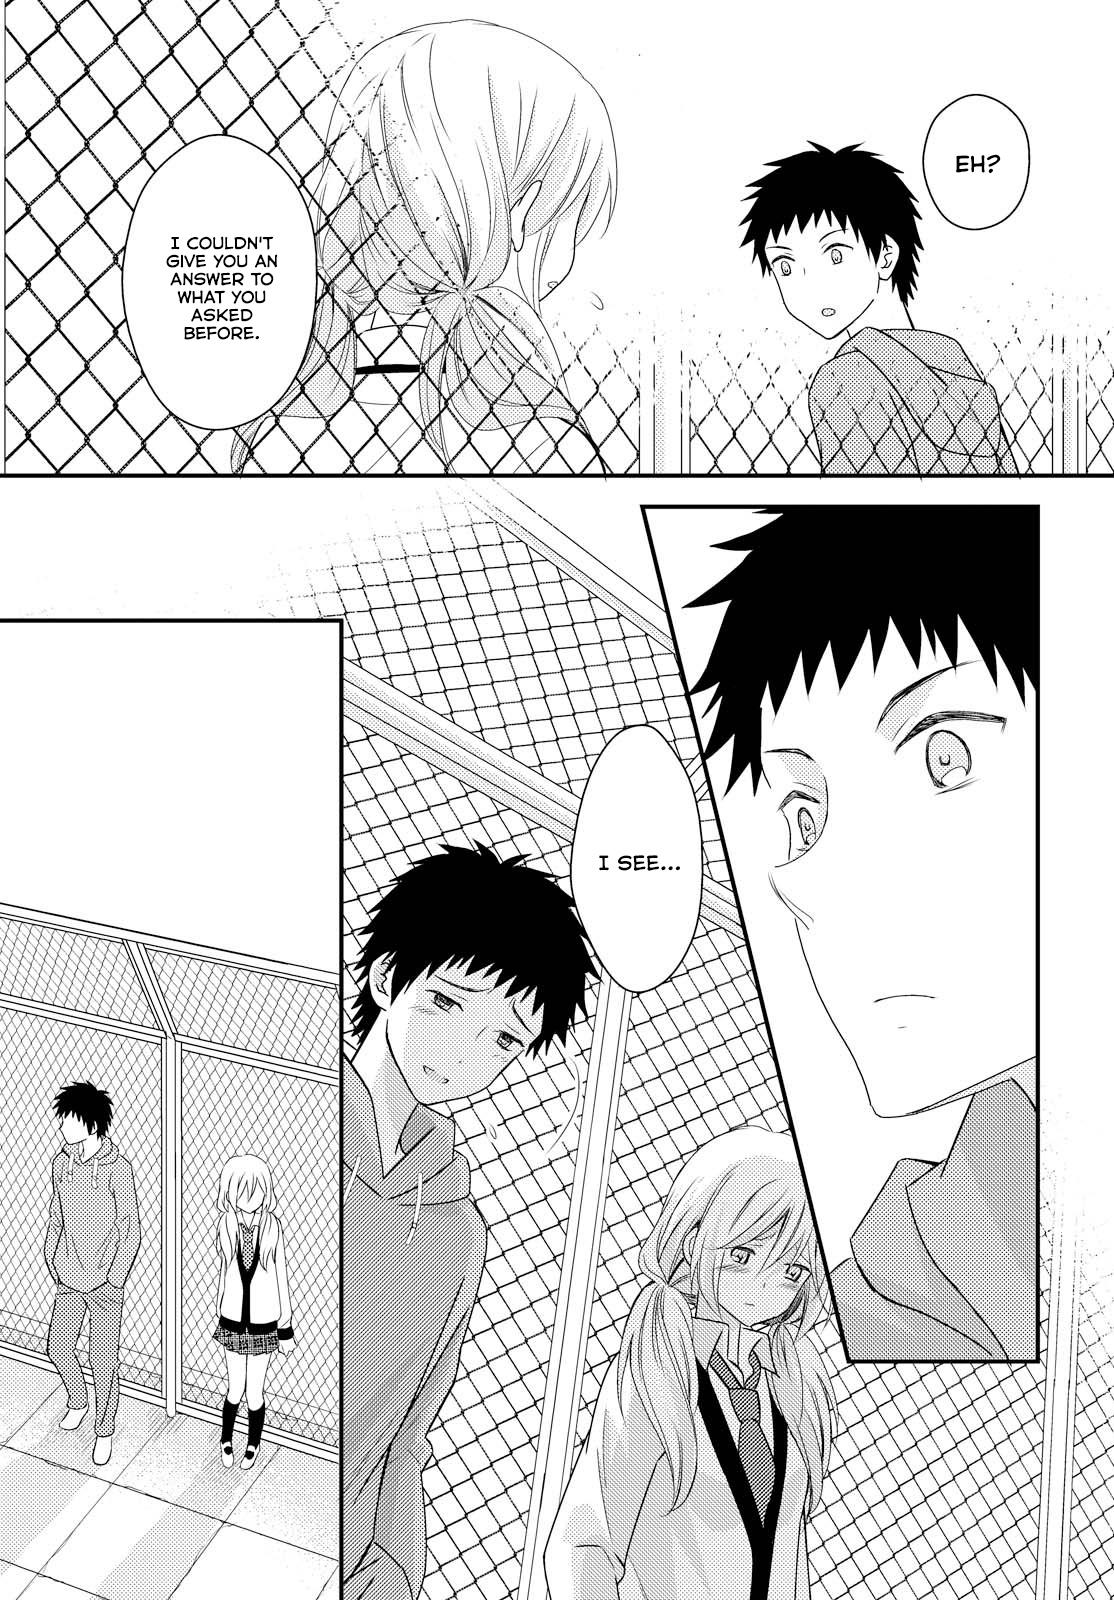 Netsuzou Trap - NTR - Chapter 24